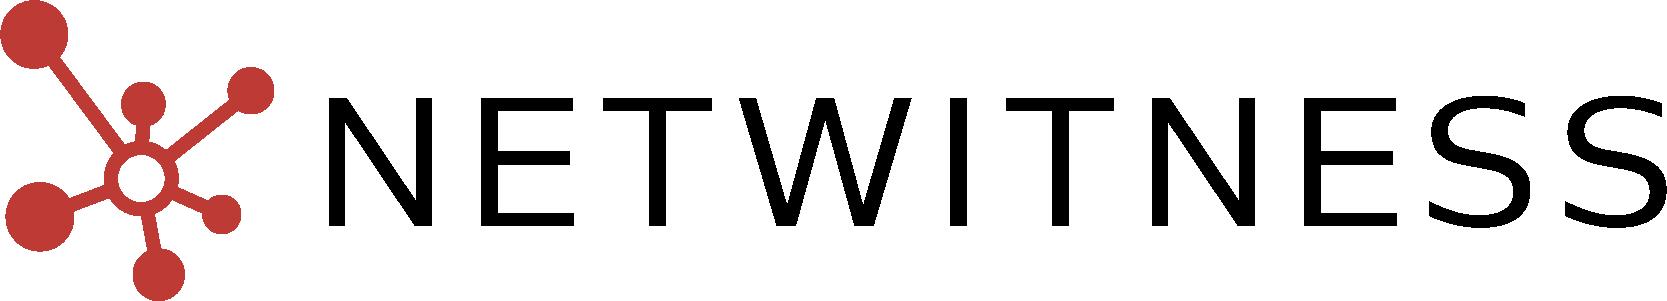 Digitalnetwitness-logo-RGB.PNG